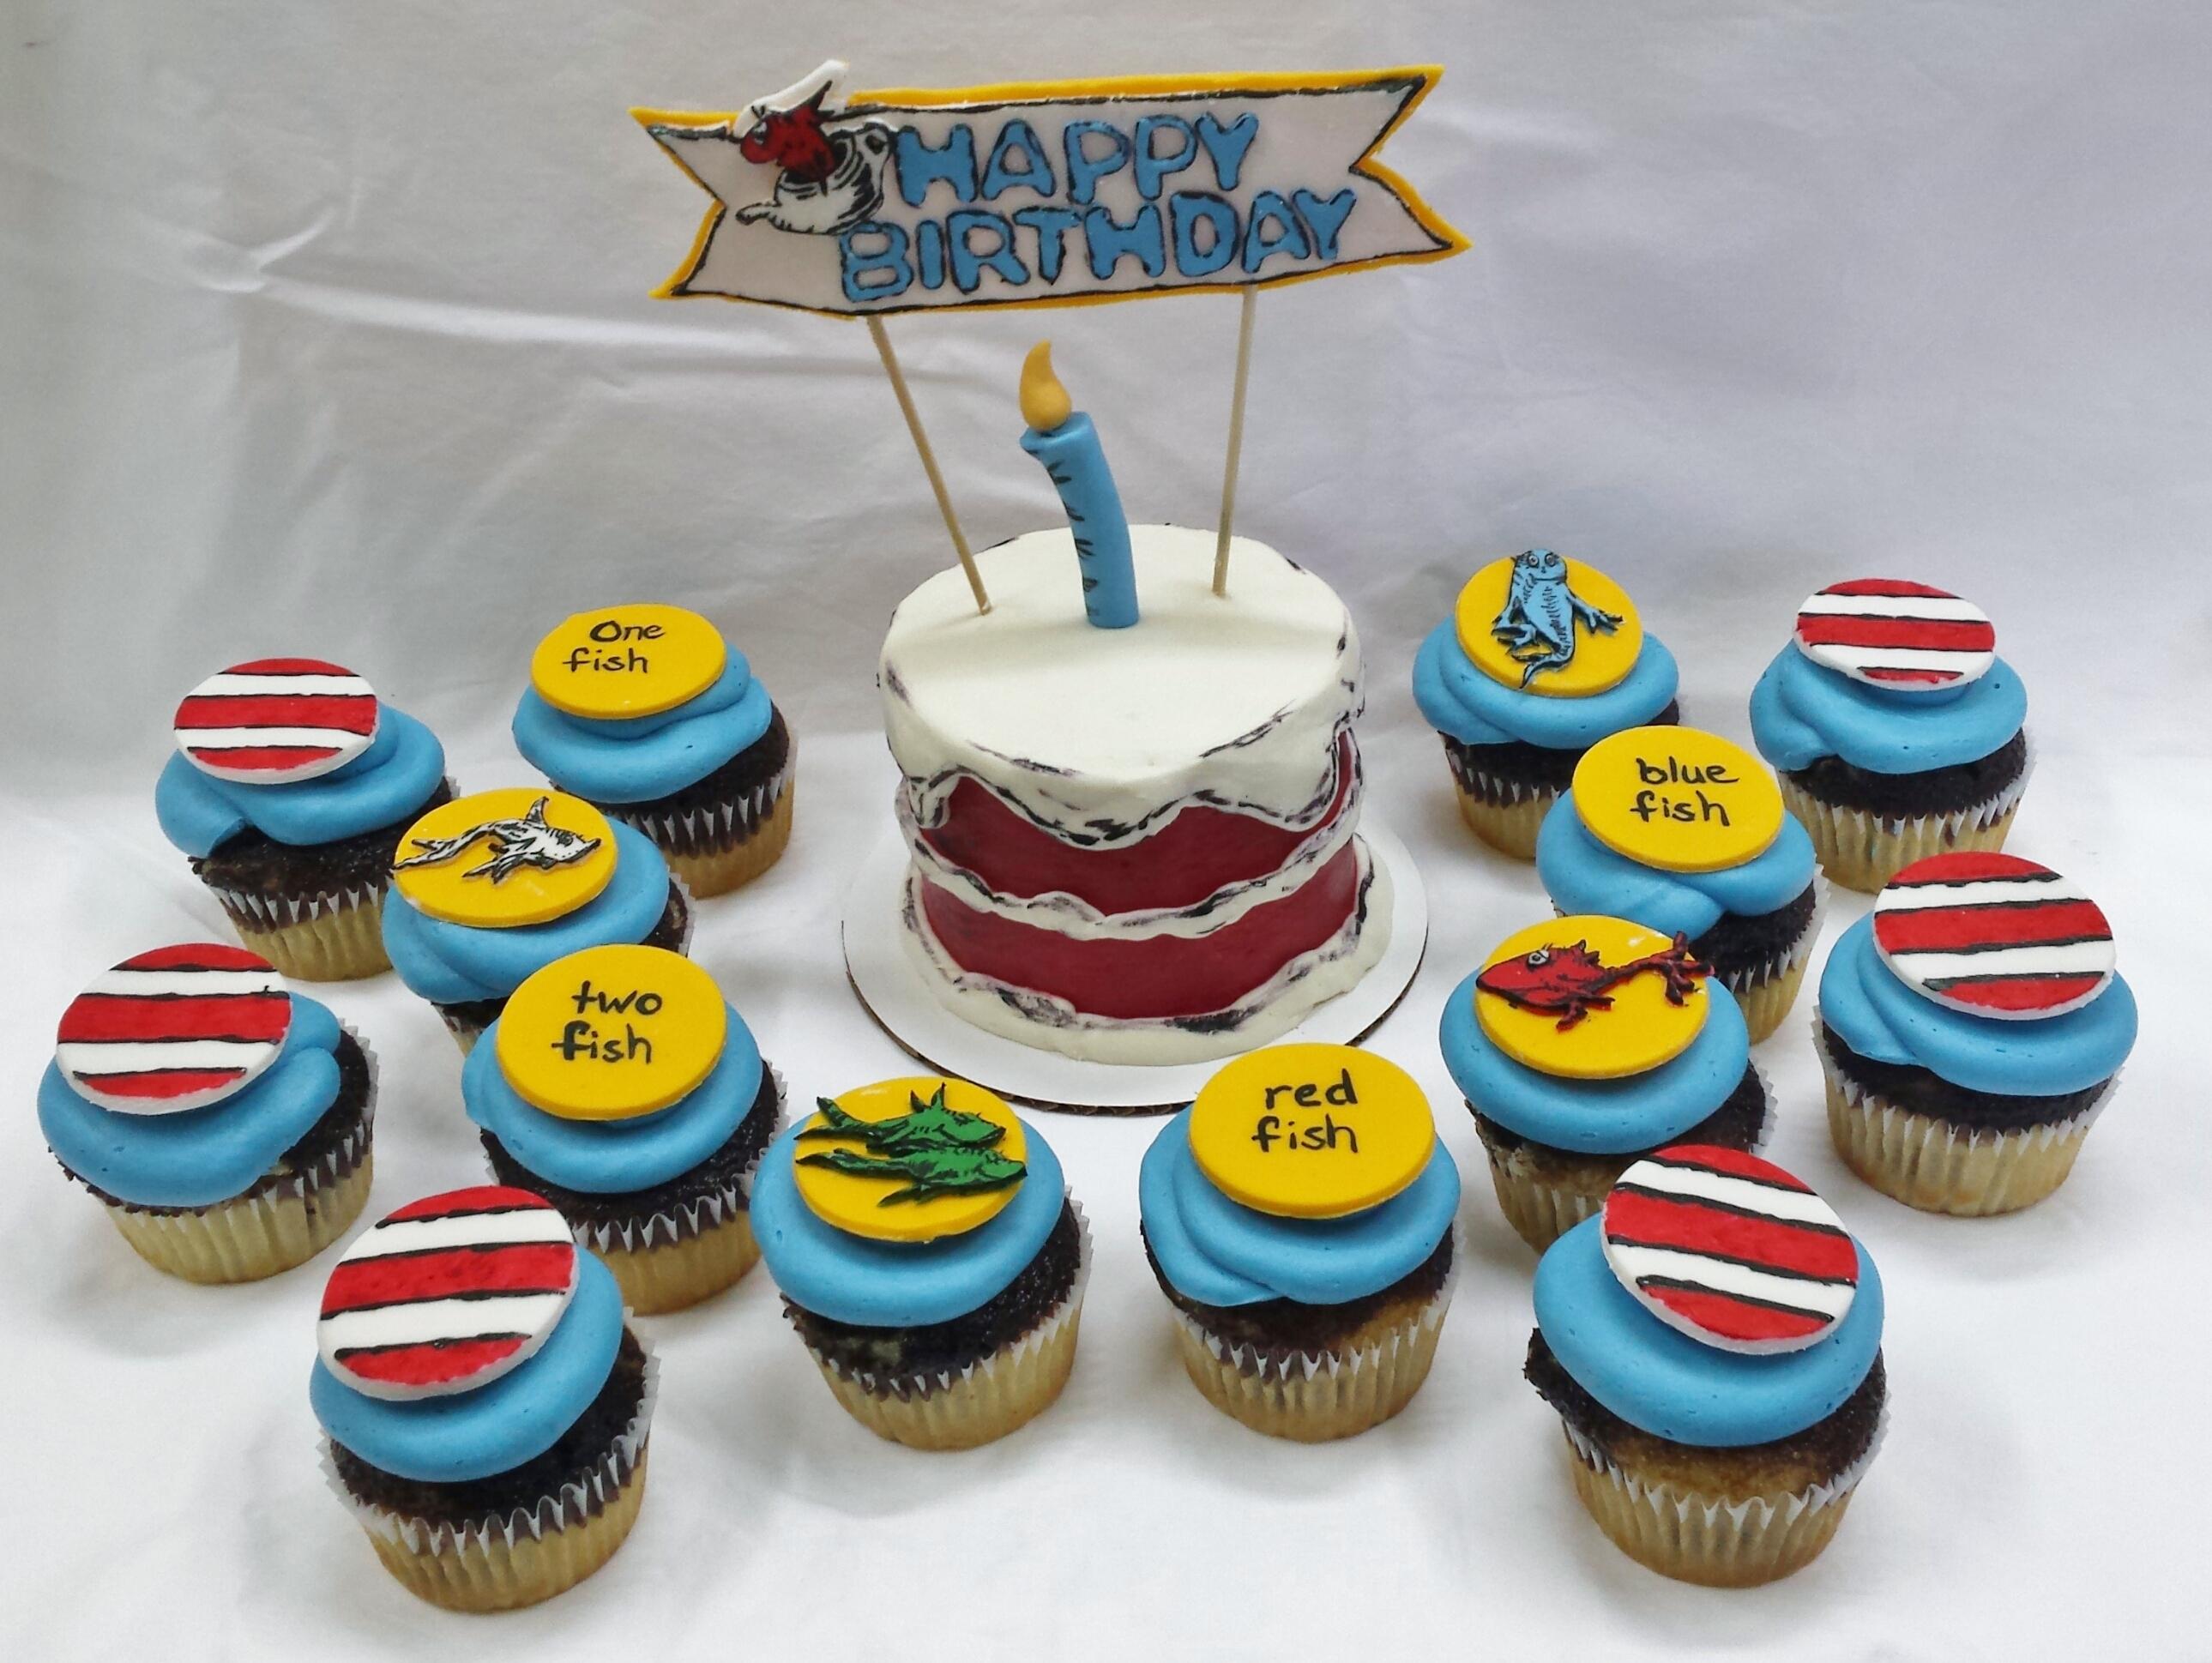 1 Fish 2 Fish Smash Cake & Cupcakes